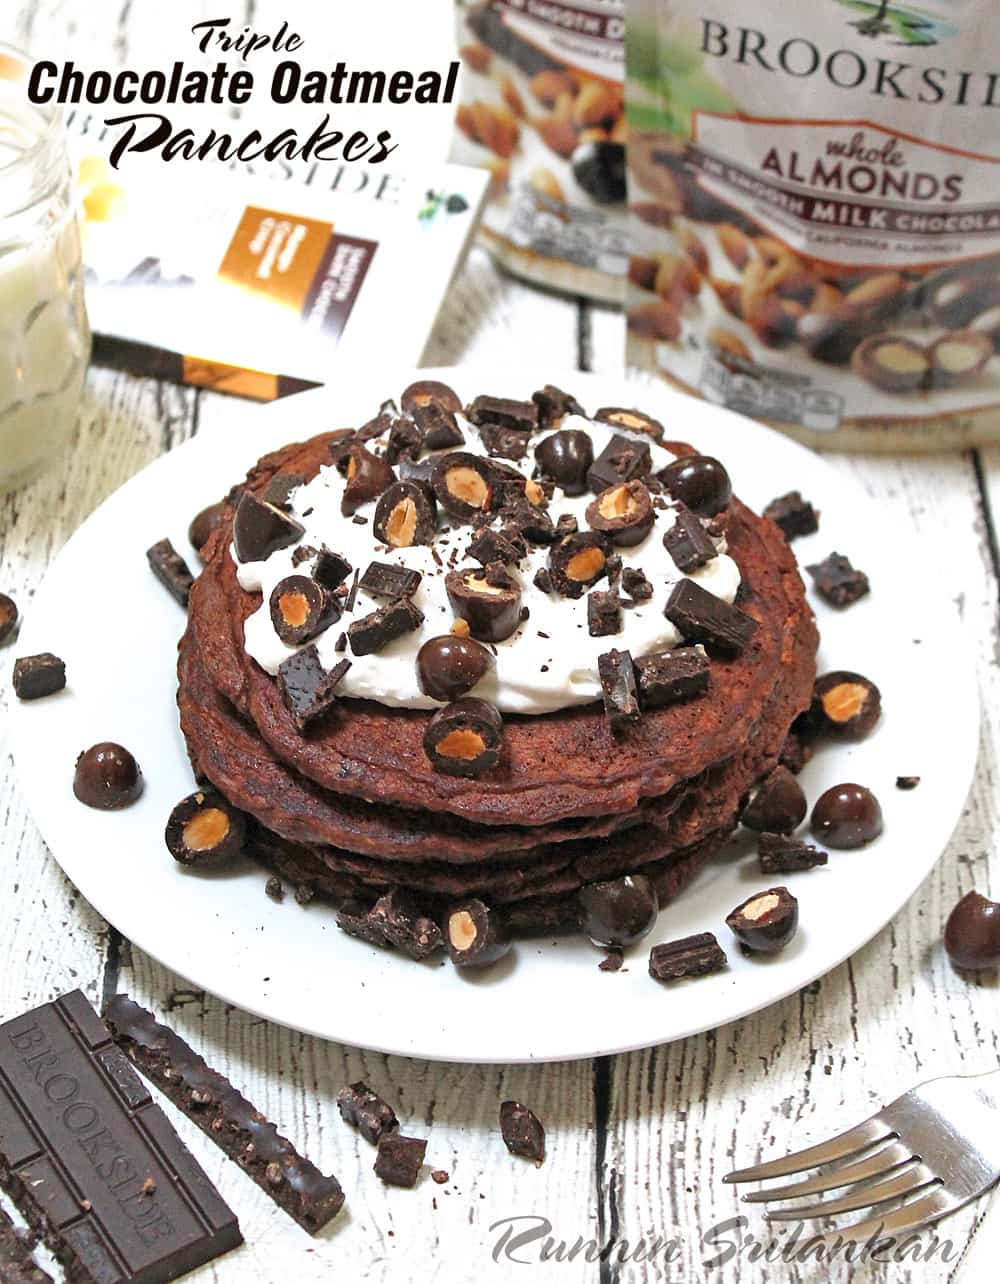 Triple Chocolate Oatmeal Pancakes #DiscoverBrookside